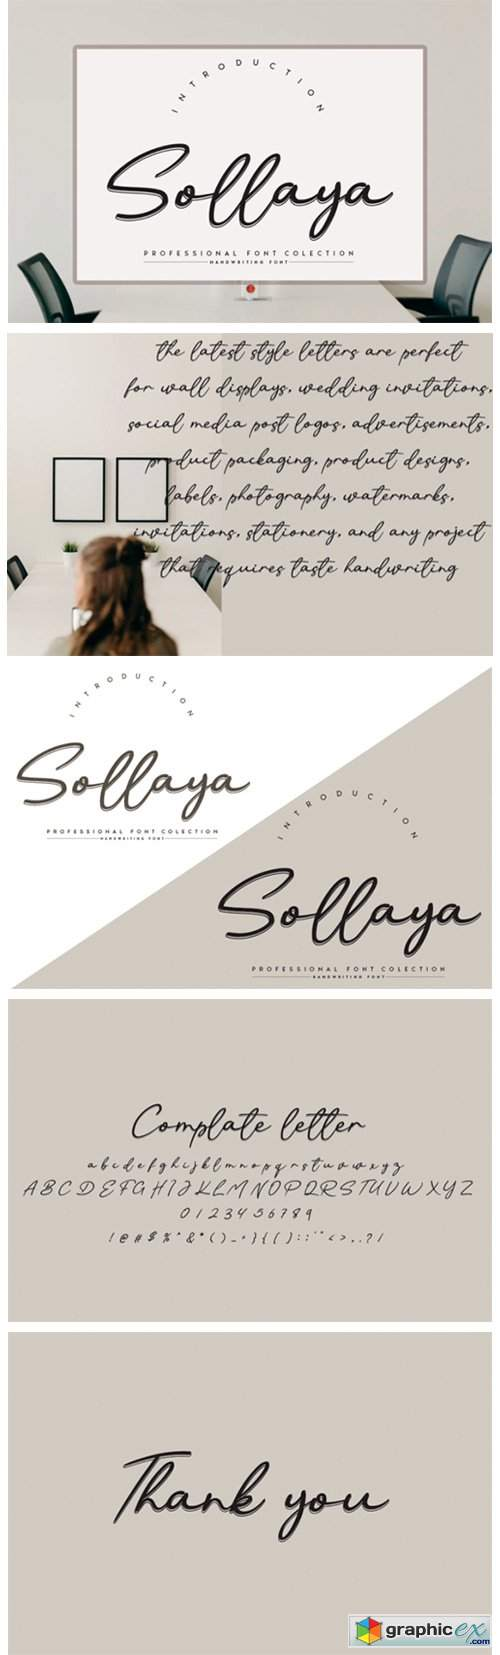 Sollaya Font